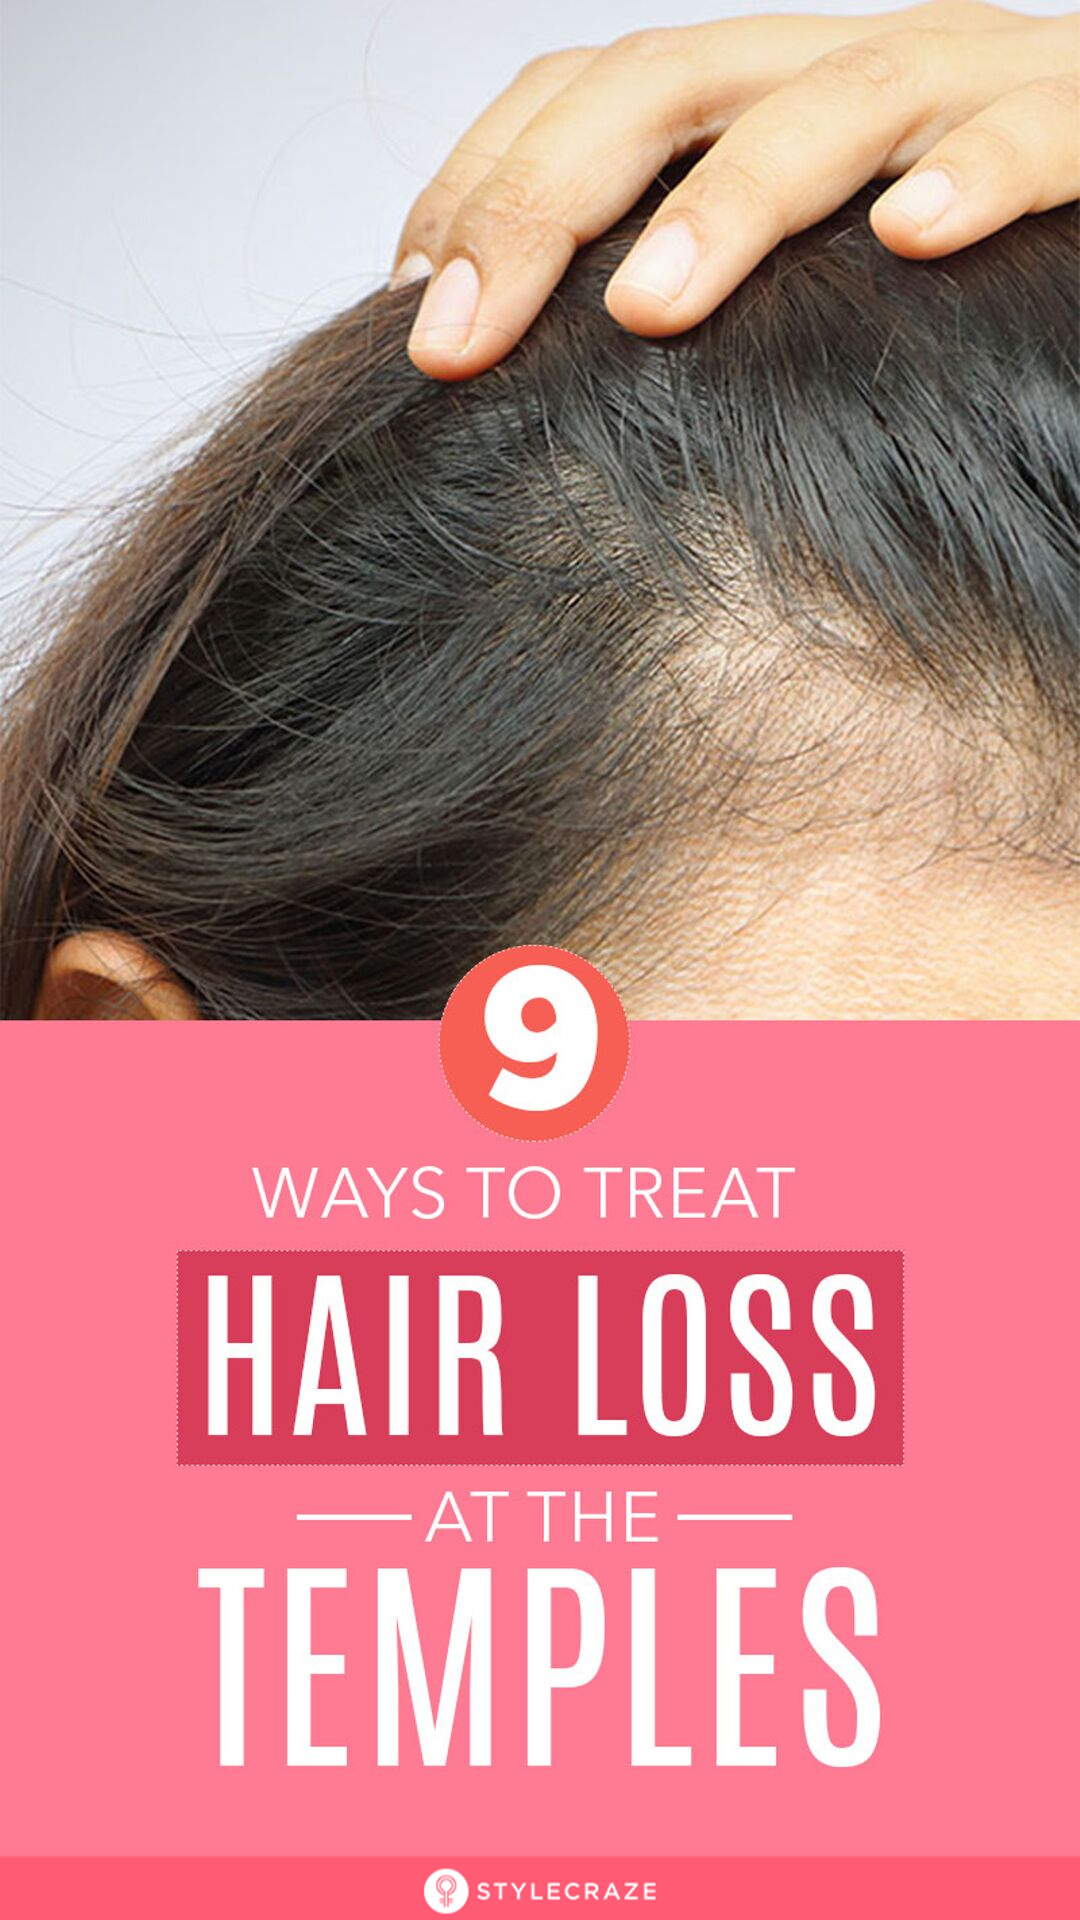 Hairlosstreatmentontario In 2020 Treat Hair Loss Temple Hair Loss Hair Loss Remedies Women